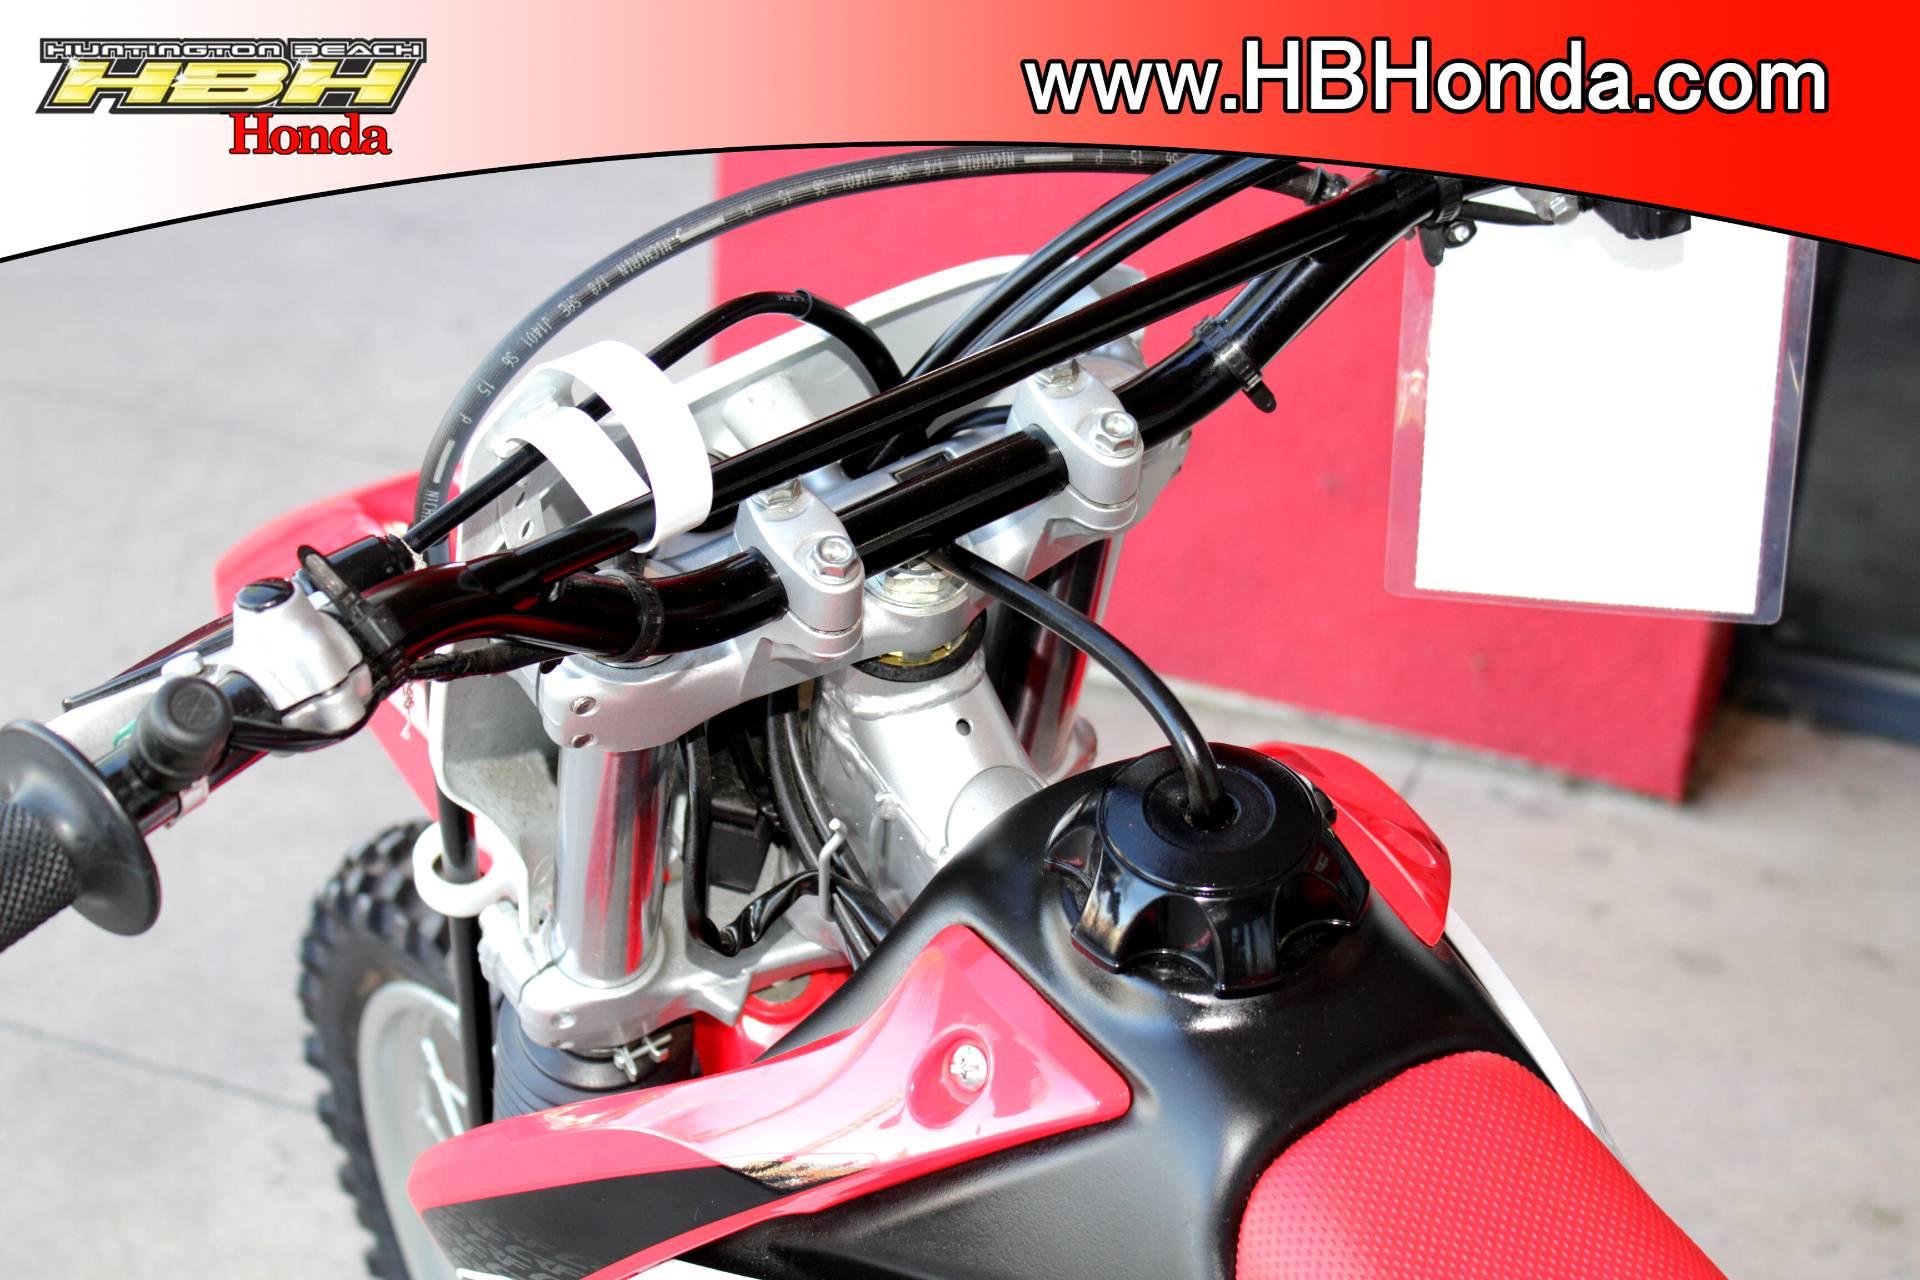 Honda Crf230f Price